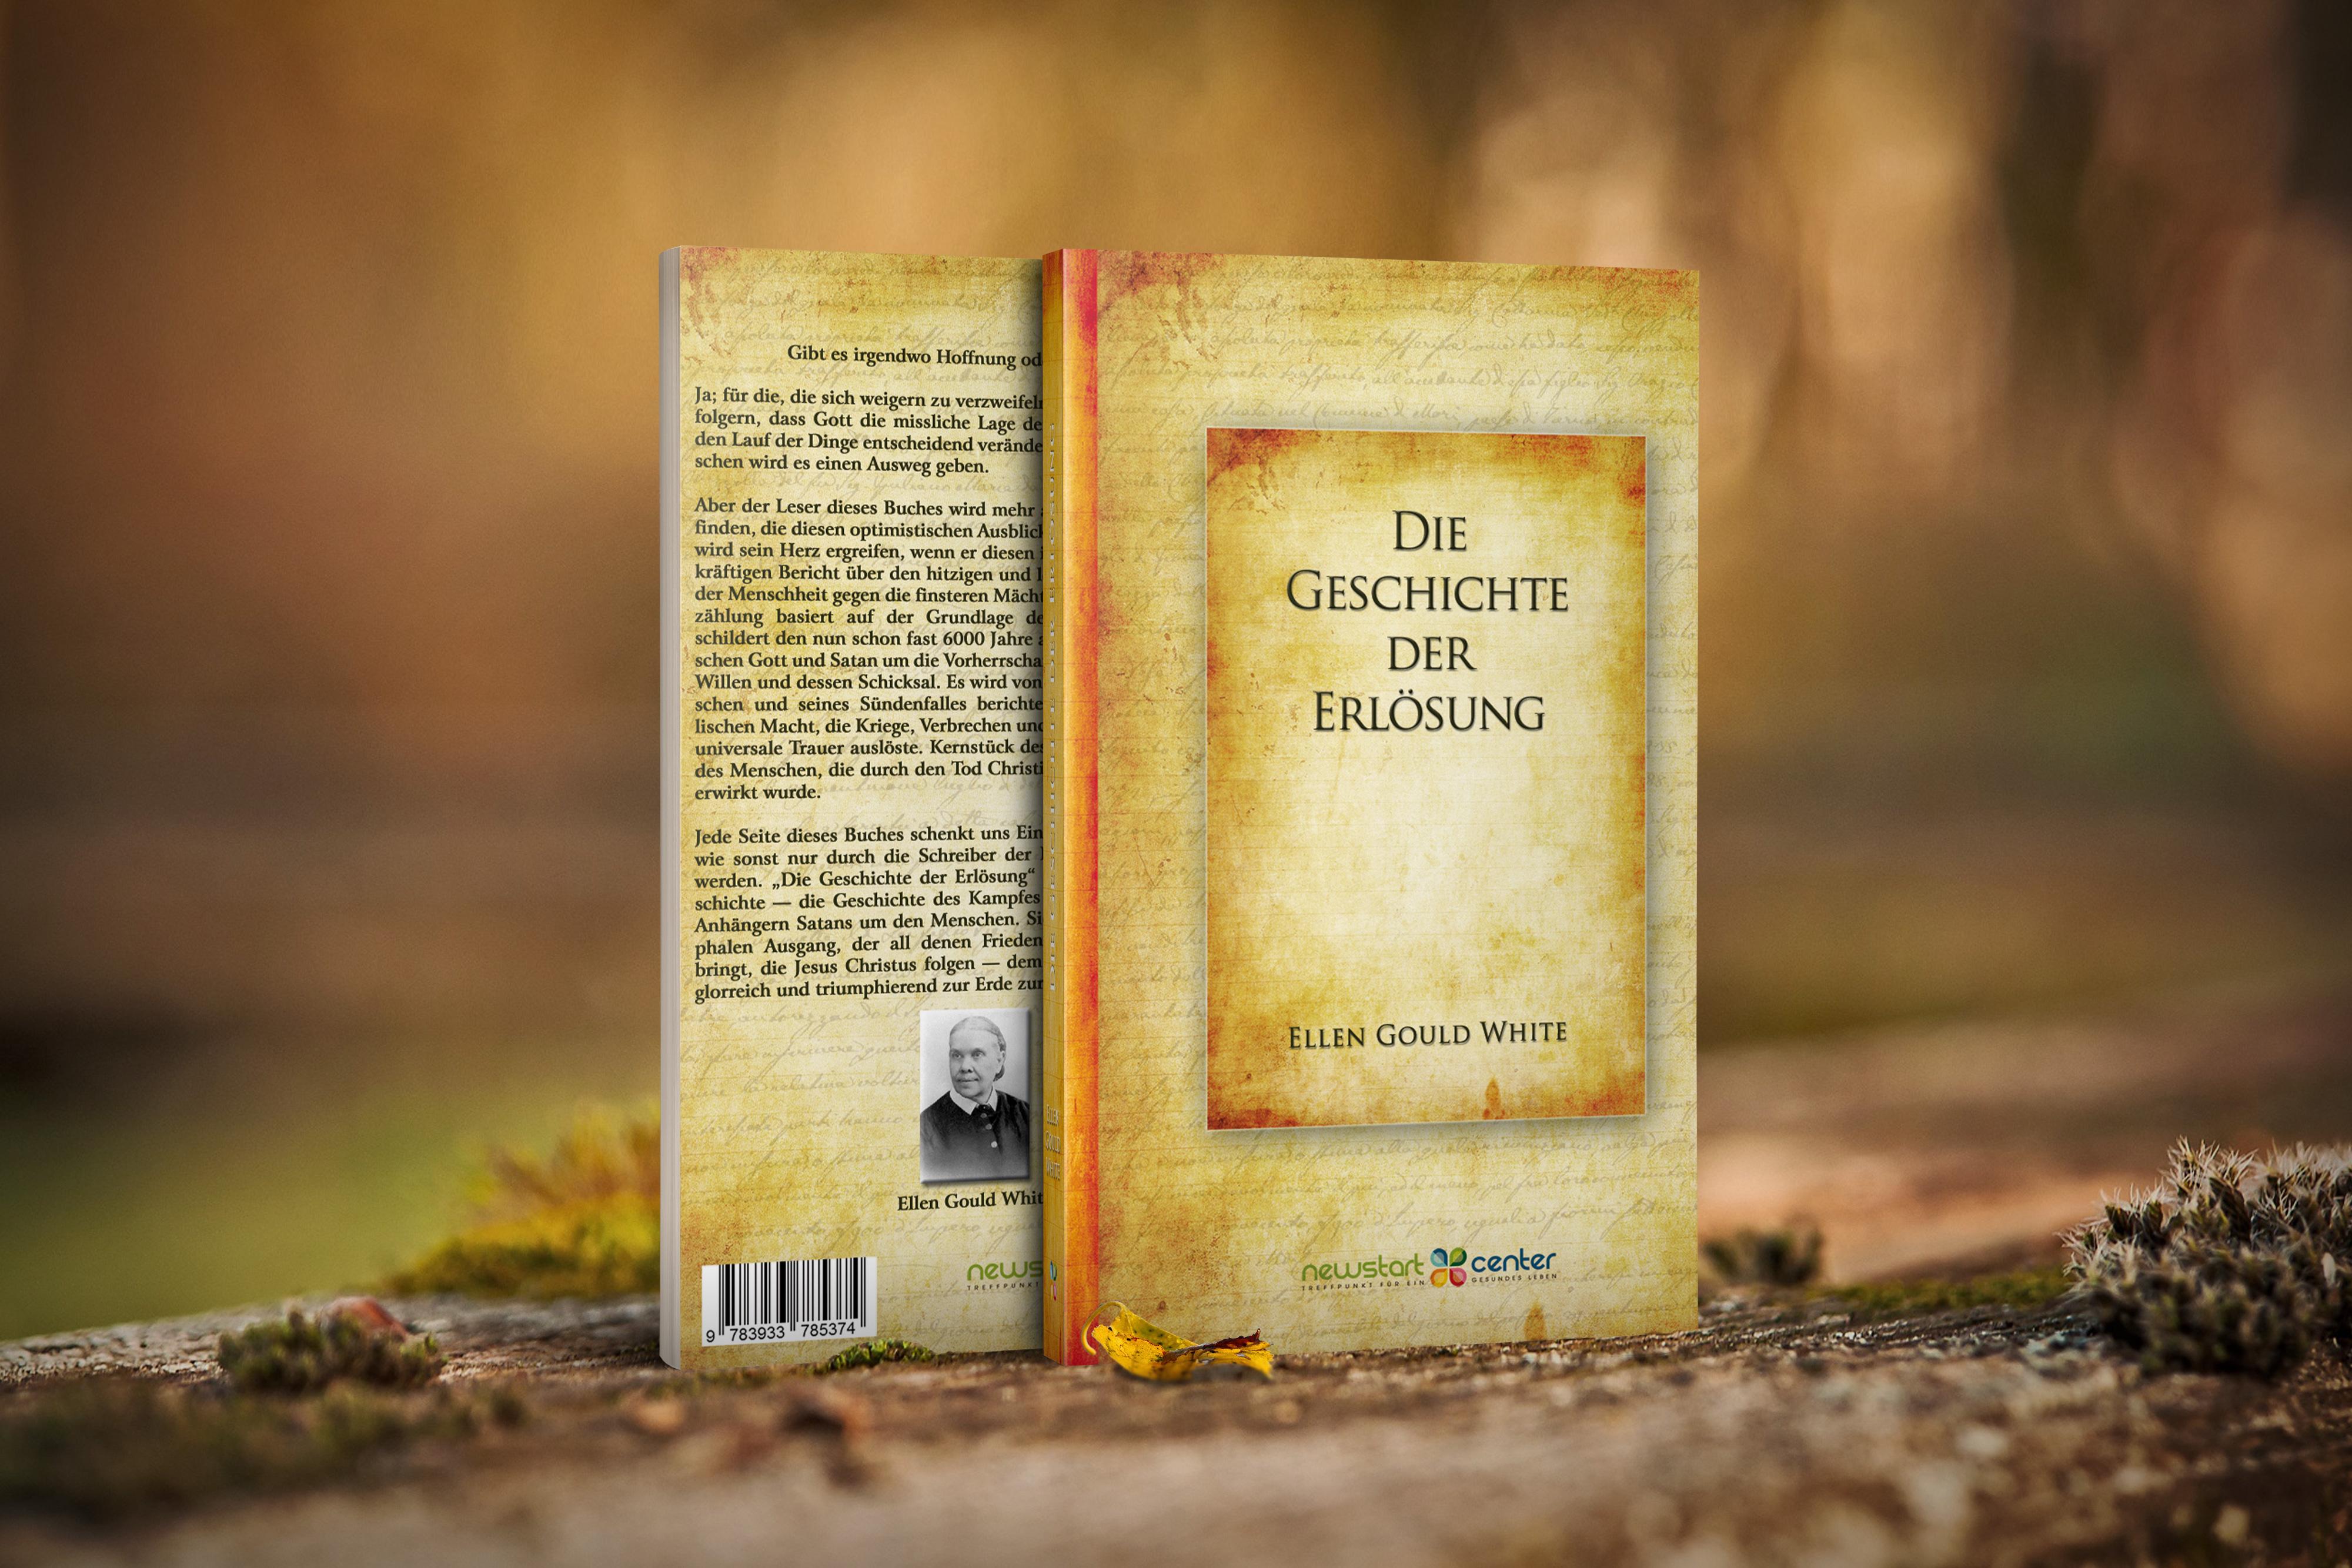 Die Geschichte der Erlösung  - Hardcover, Bebildert